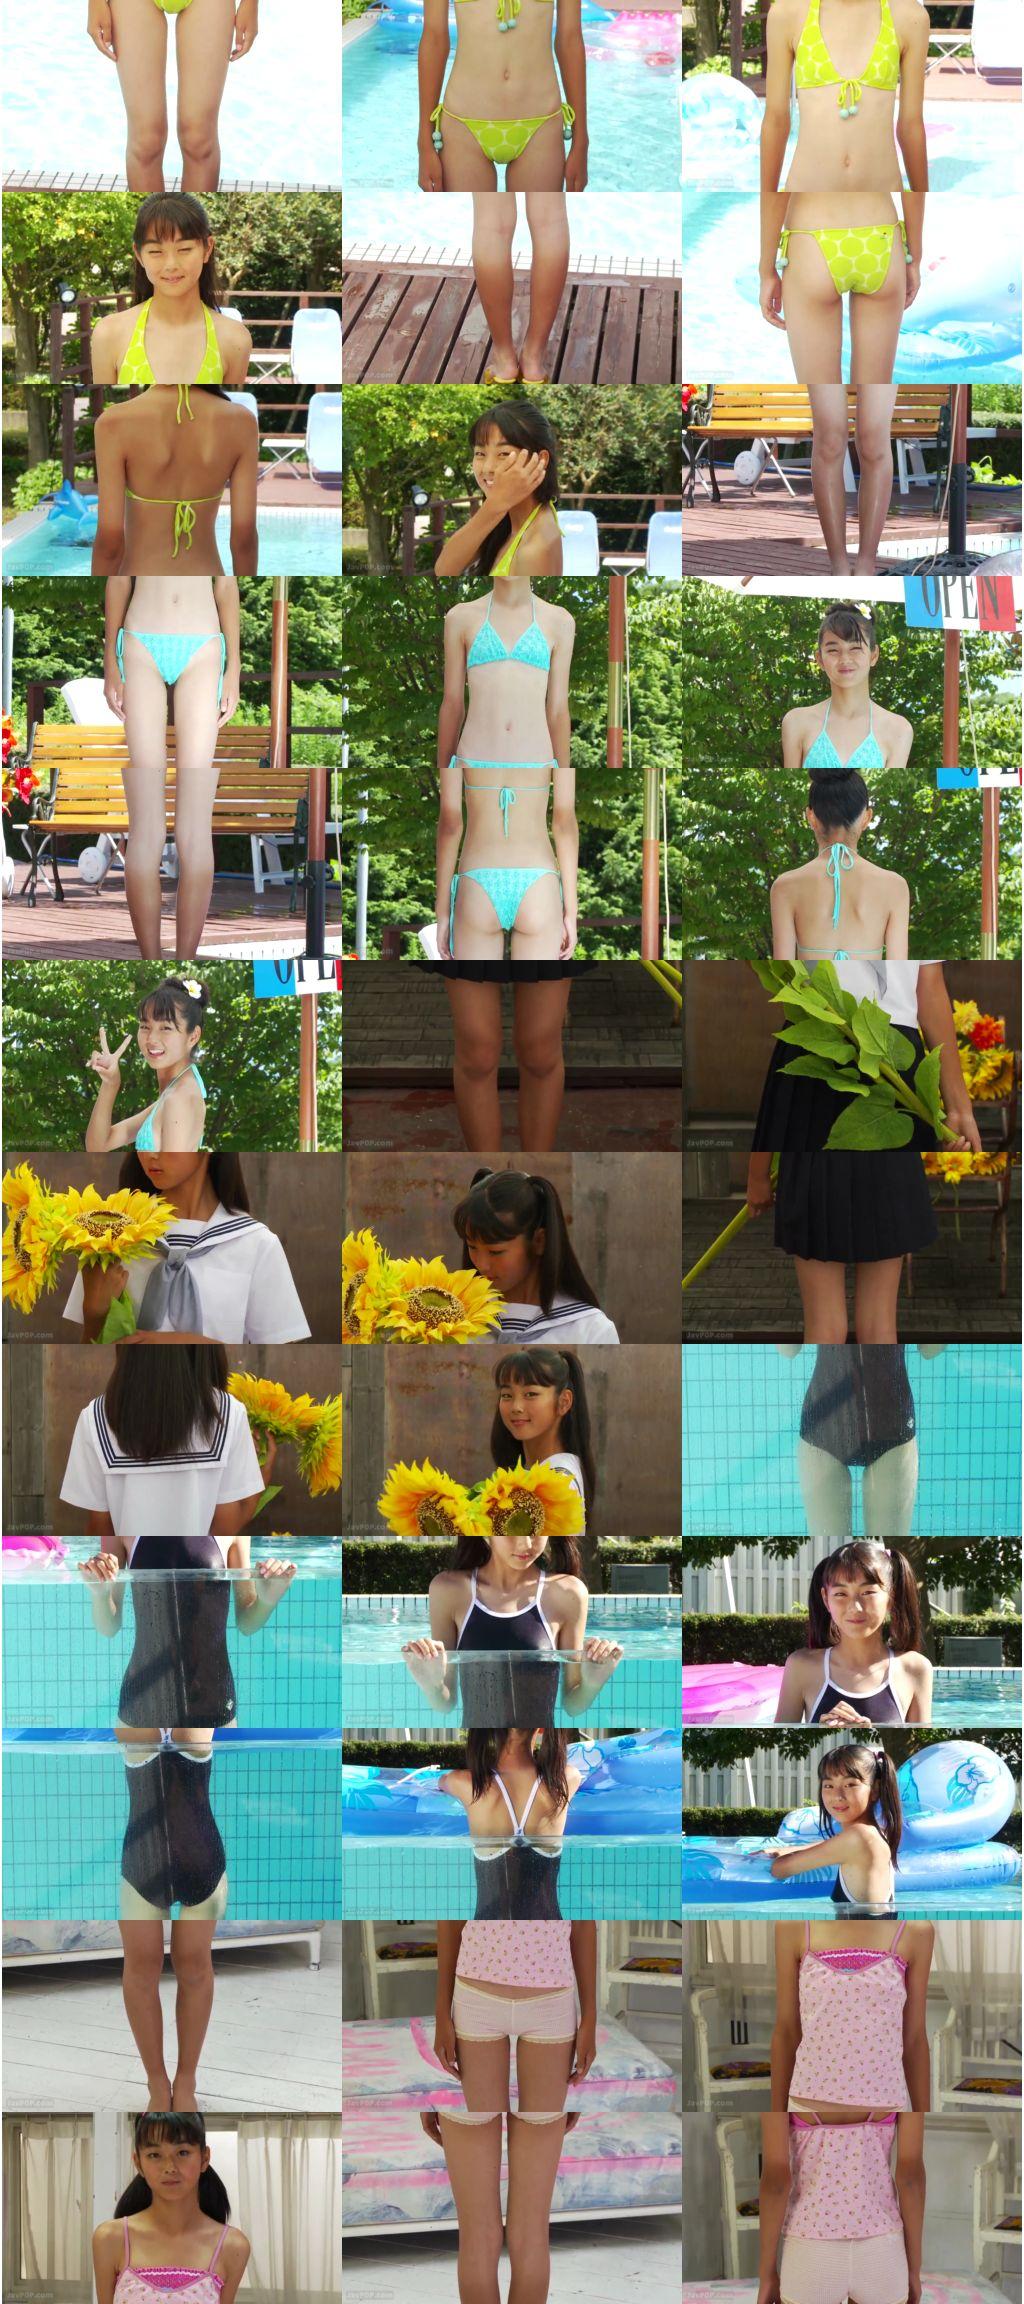 imbd 110 1 s - [IMBD-110] 河合真由 Mayu Kawai – 夏少女 Part2 残暑お見舞い申し上げ